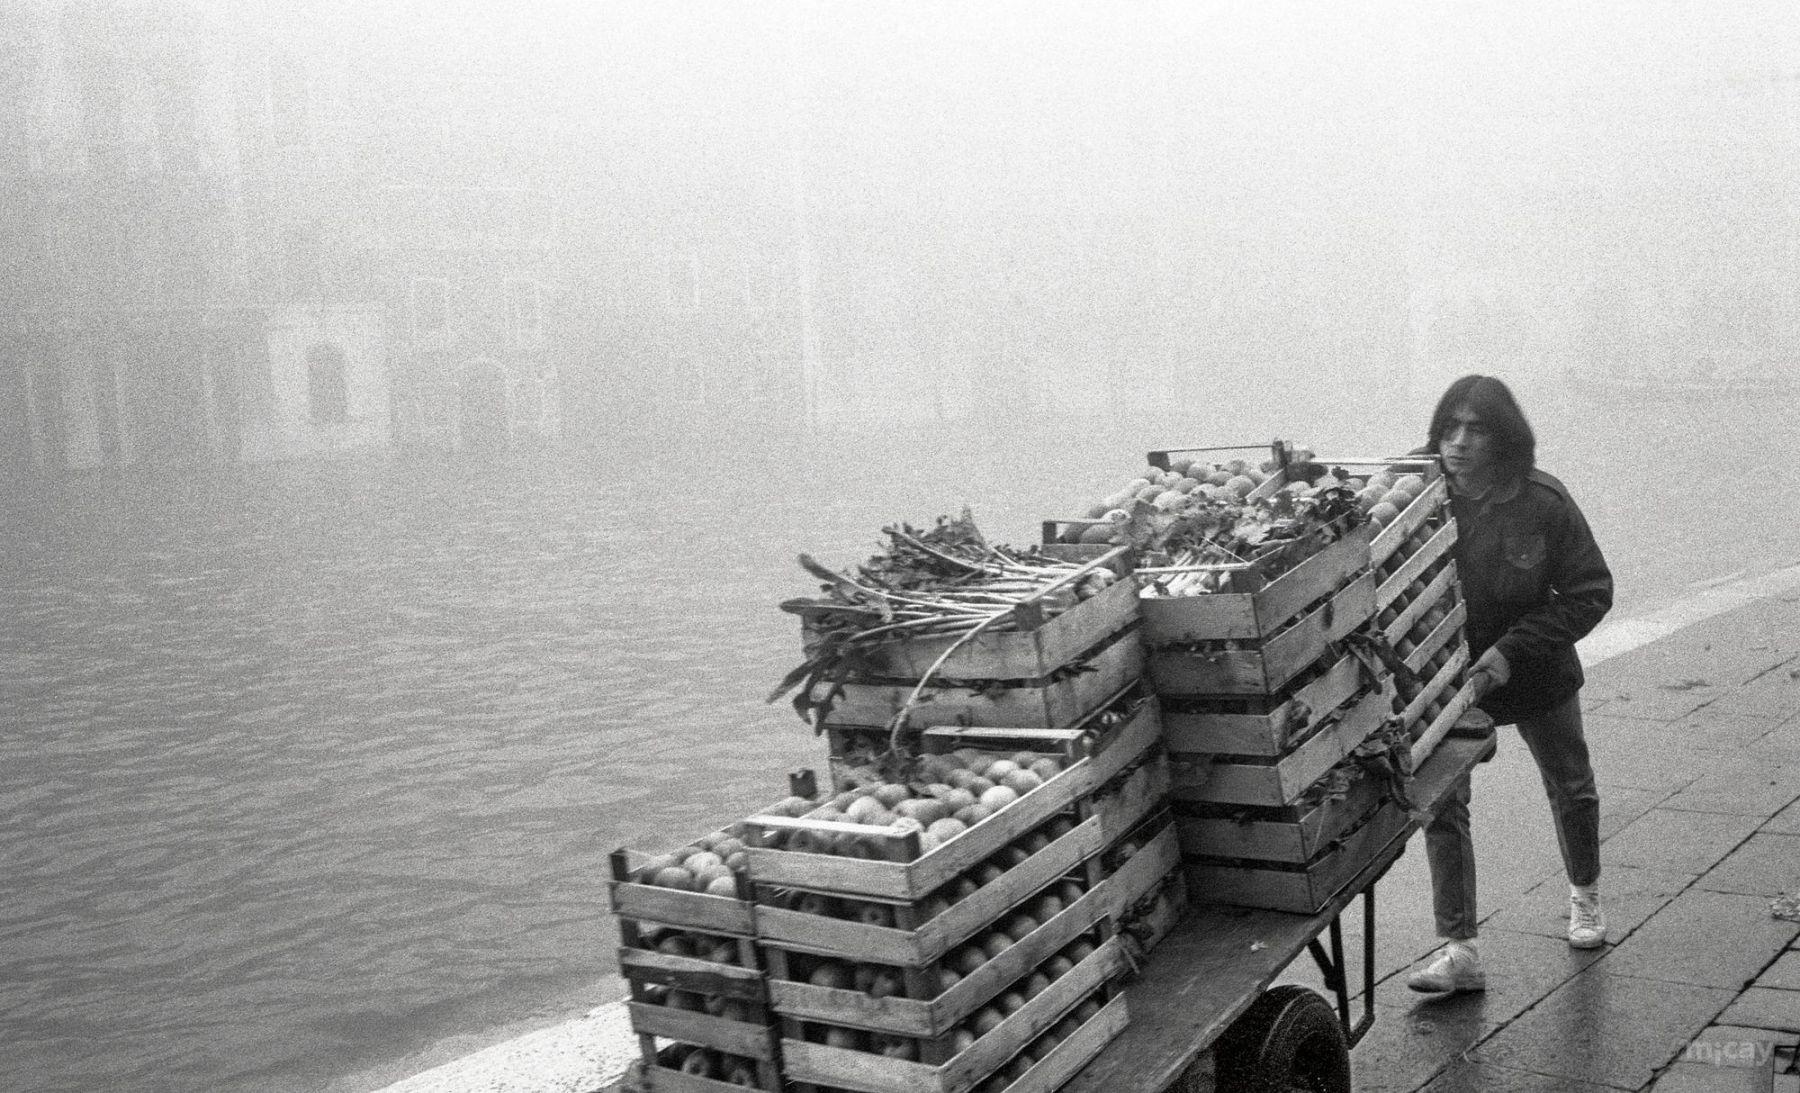 MichelAycaguer-Venise-AquaAlta-Noel-1981-8